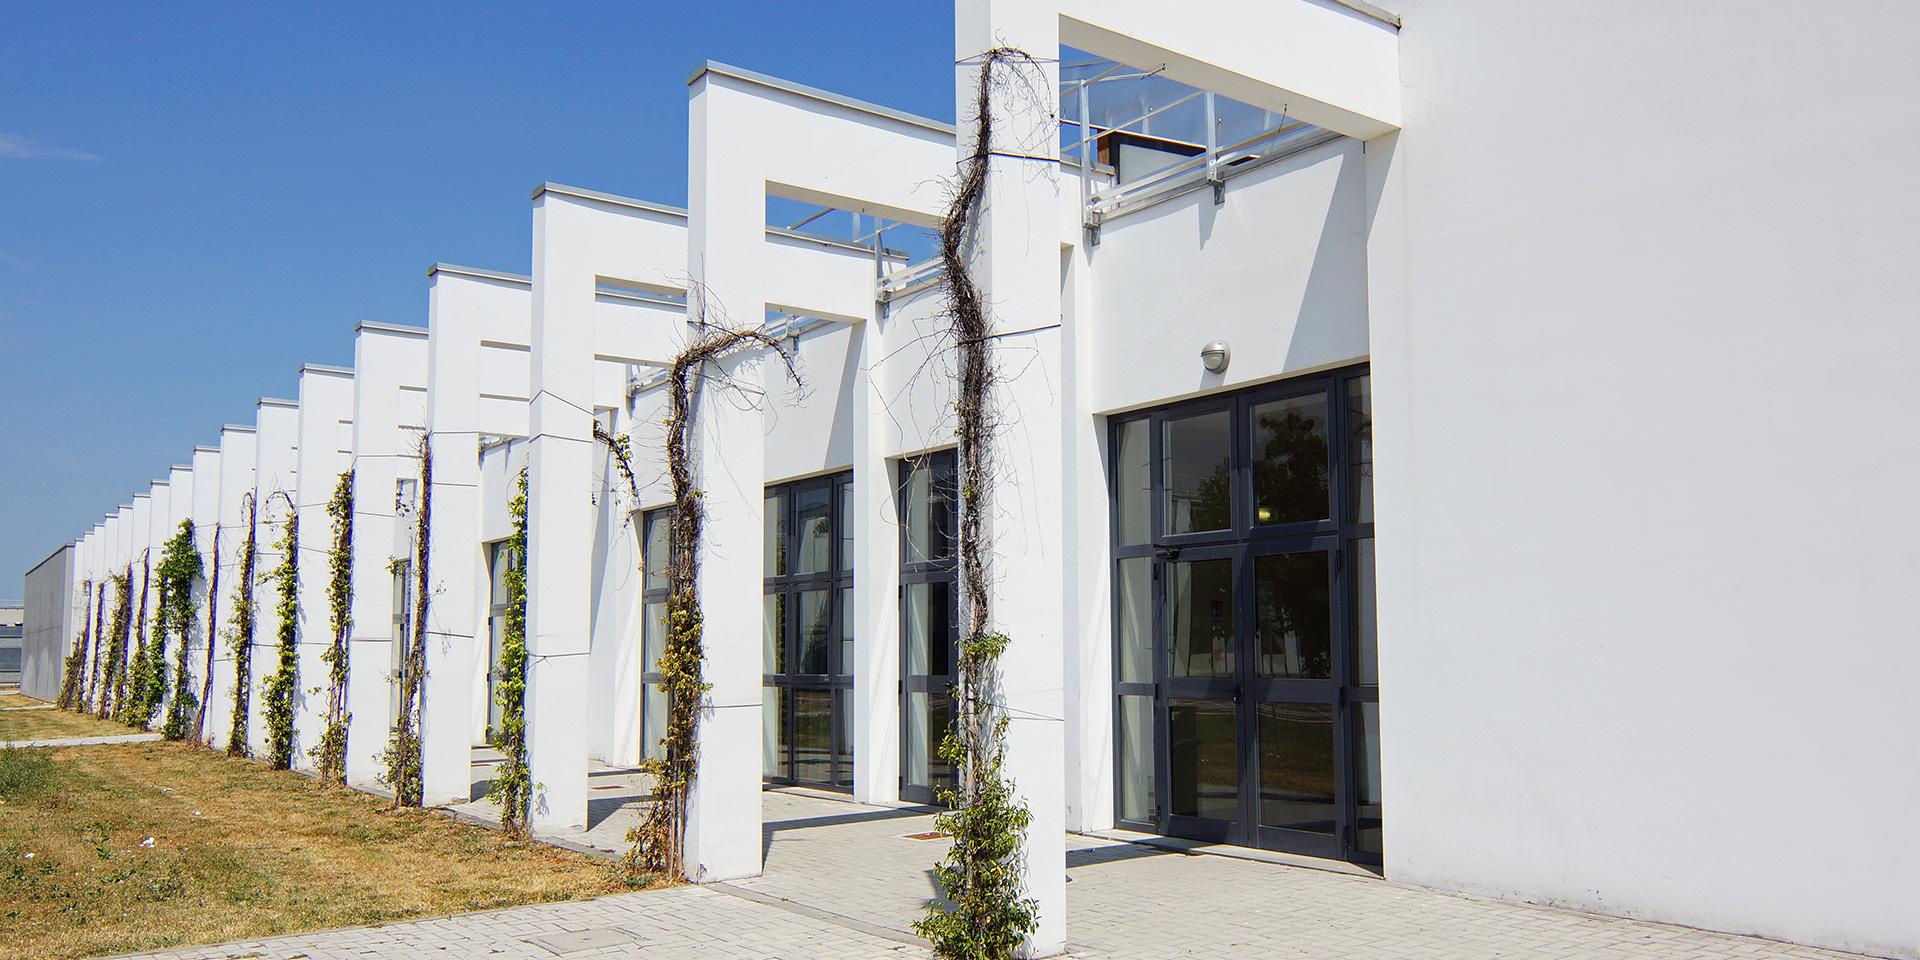 Aule Campus Università di Parma, Binini Partners, Società di architettura e ingegneria